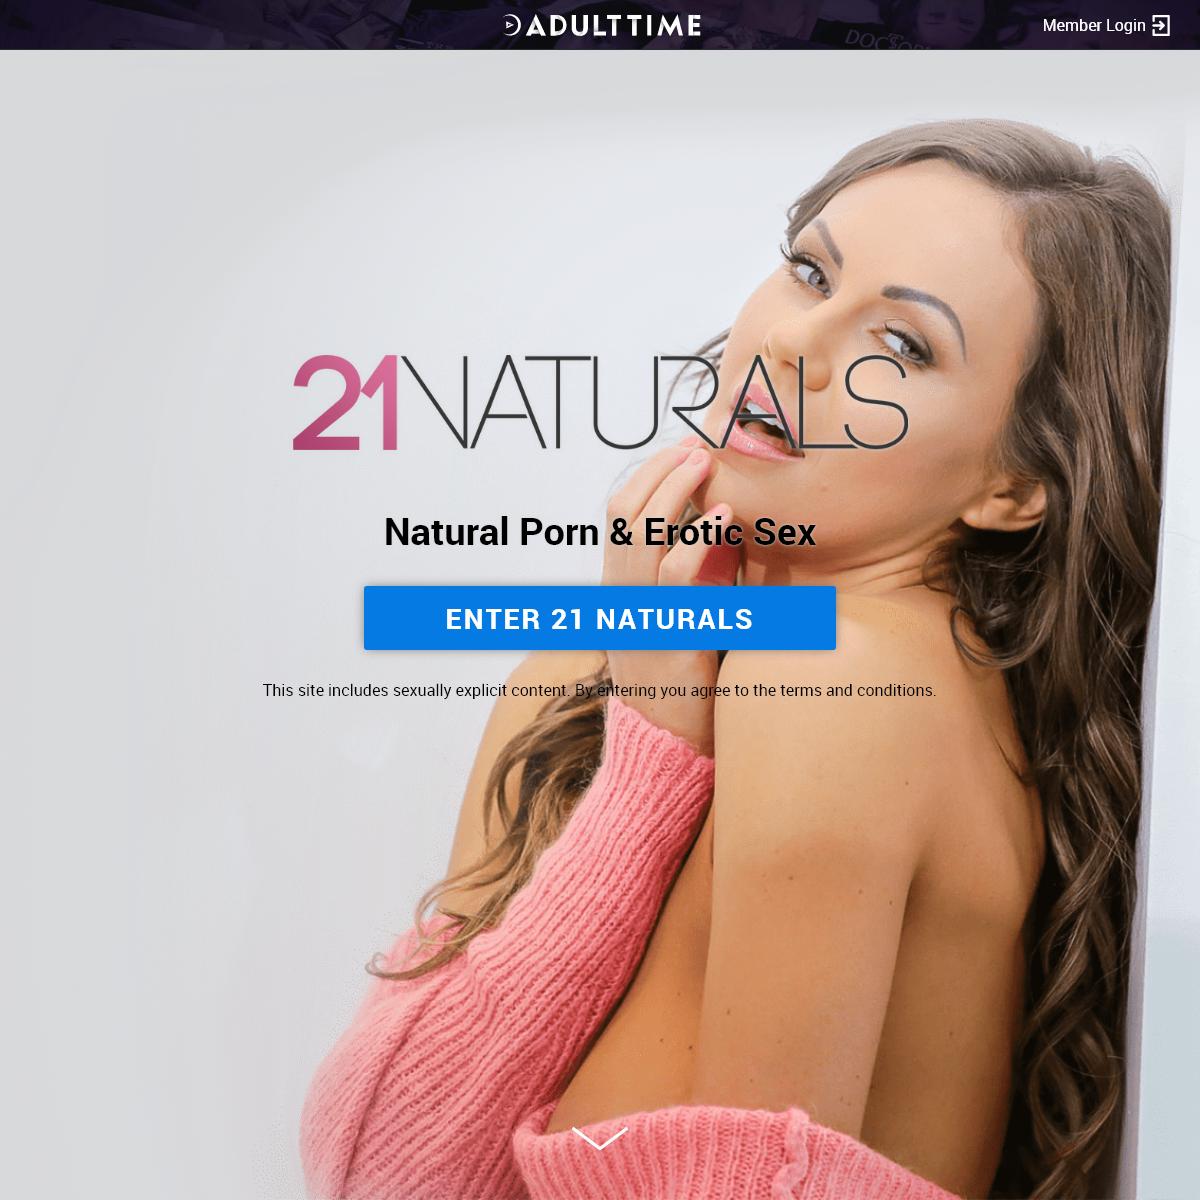 A complete backup of www.21naturals.com